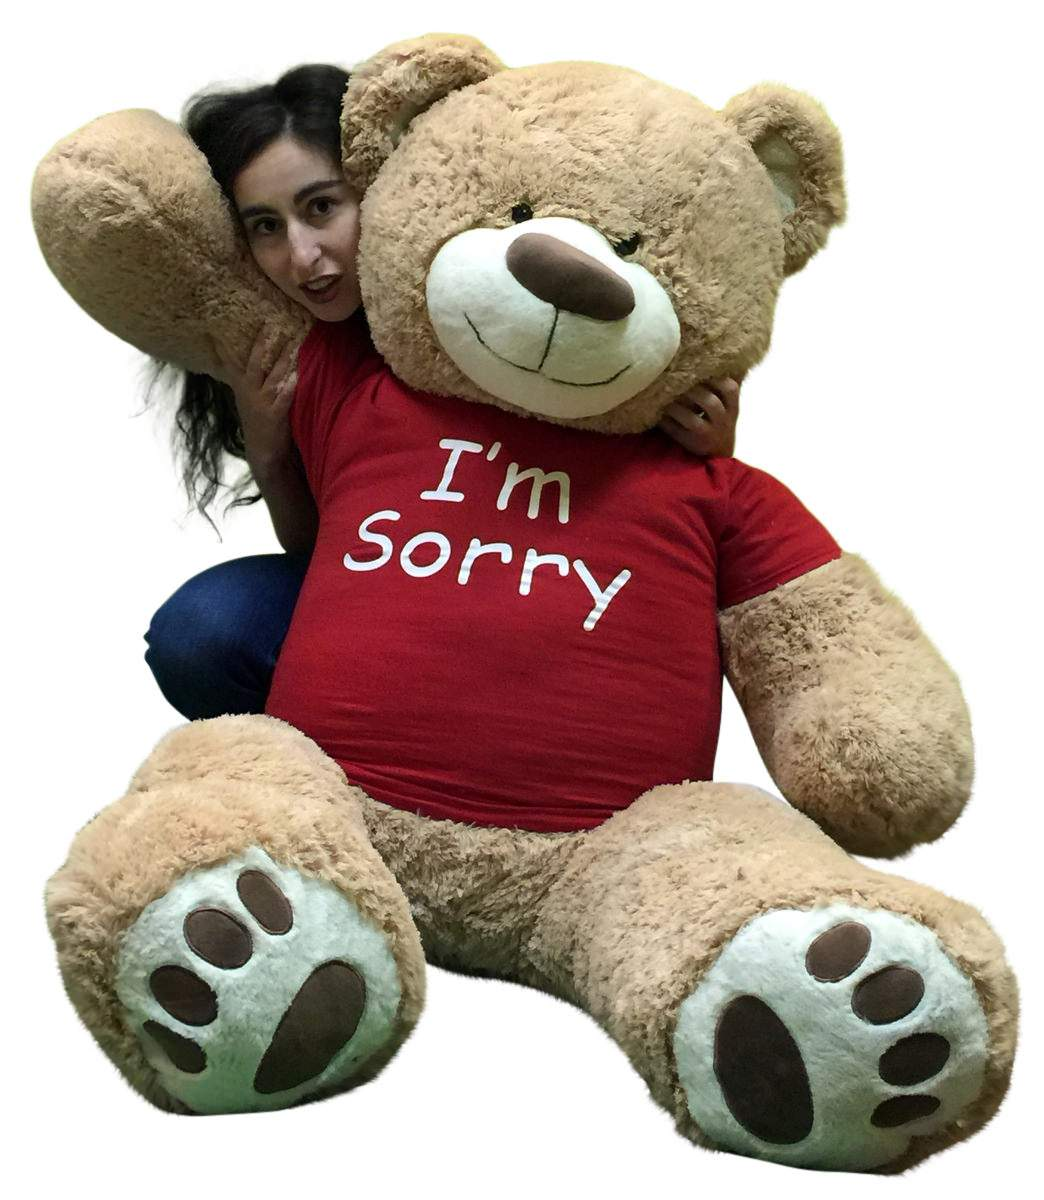 I'm Sorry Giant Teddy Bear 5 Feet Tall Tan Color Soft Wears T shirt that says I'M SORRY by BigPlush